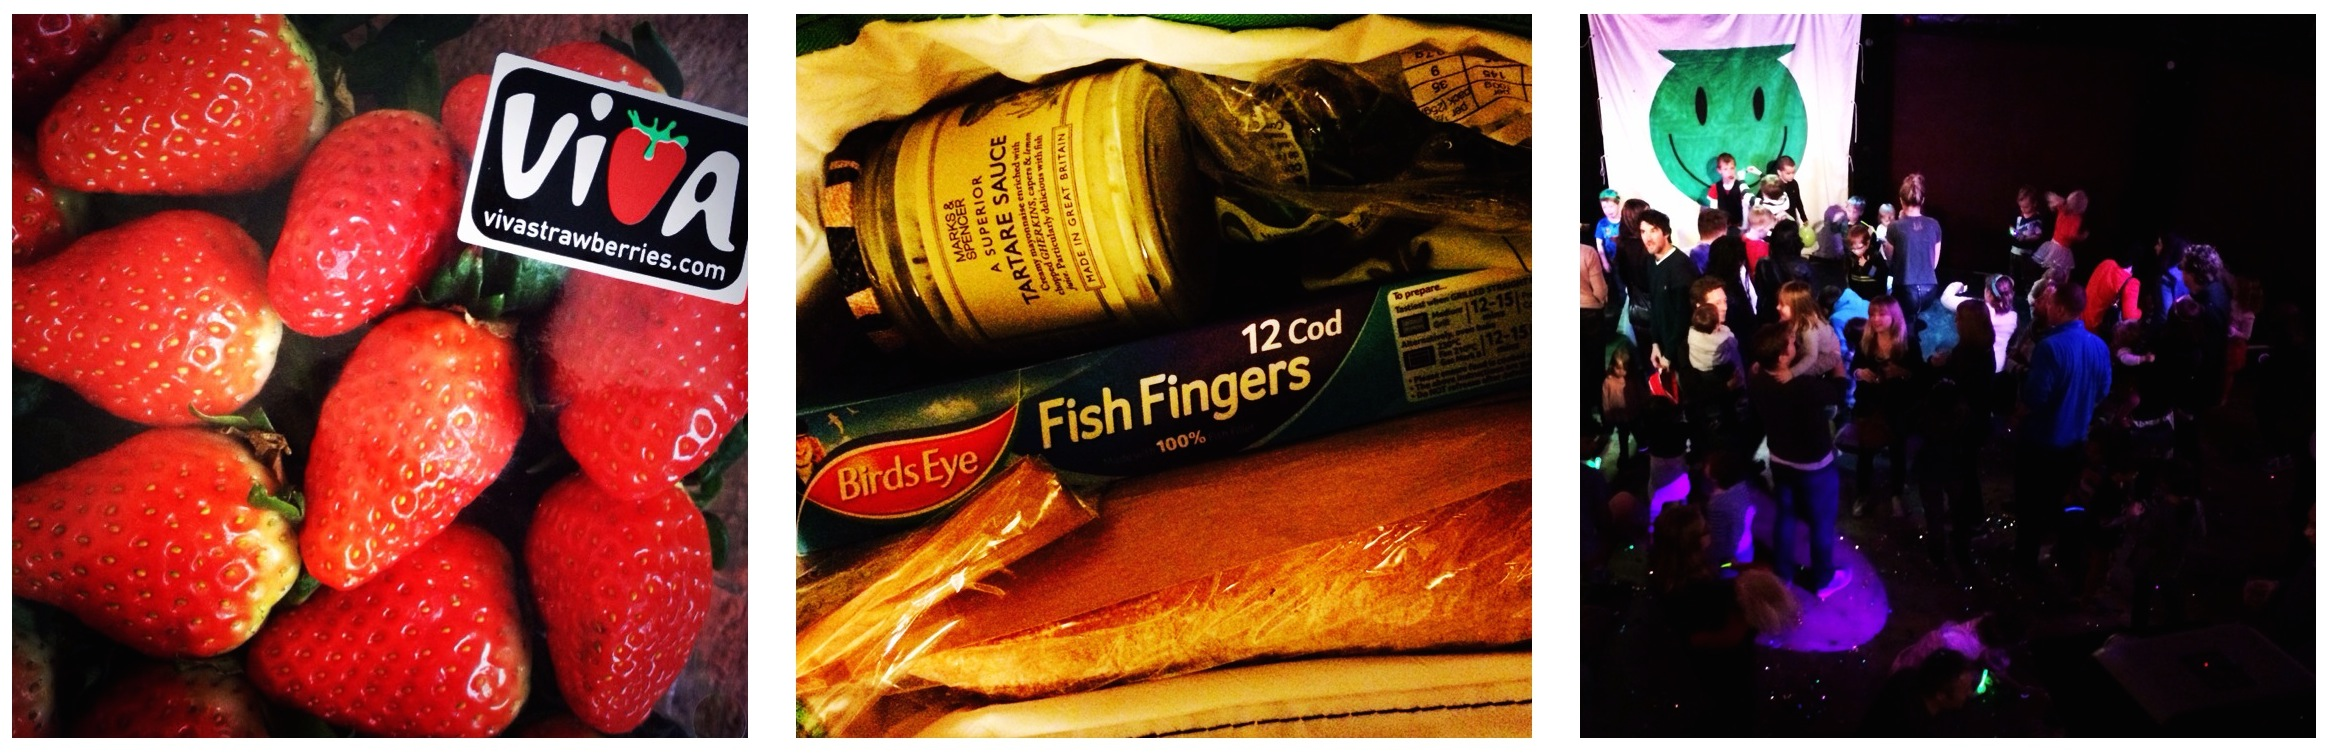 Strawberries, fish fingers, baby raves